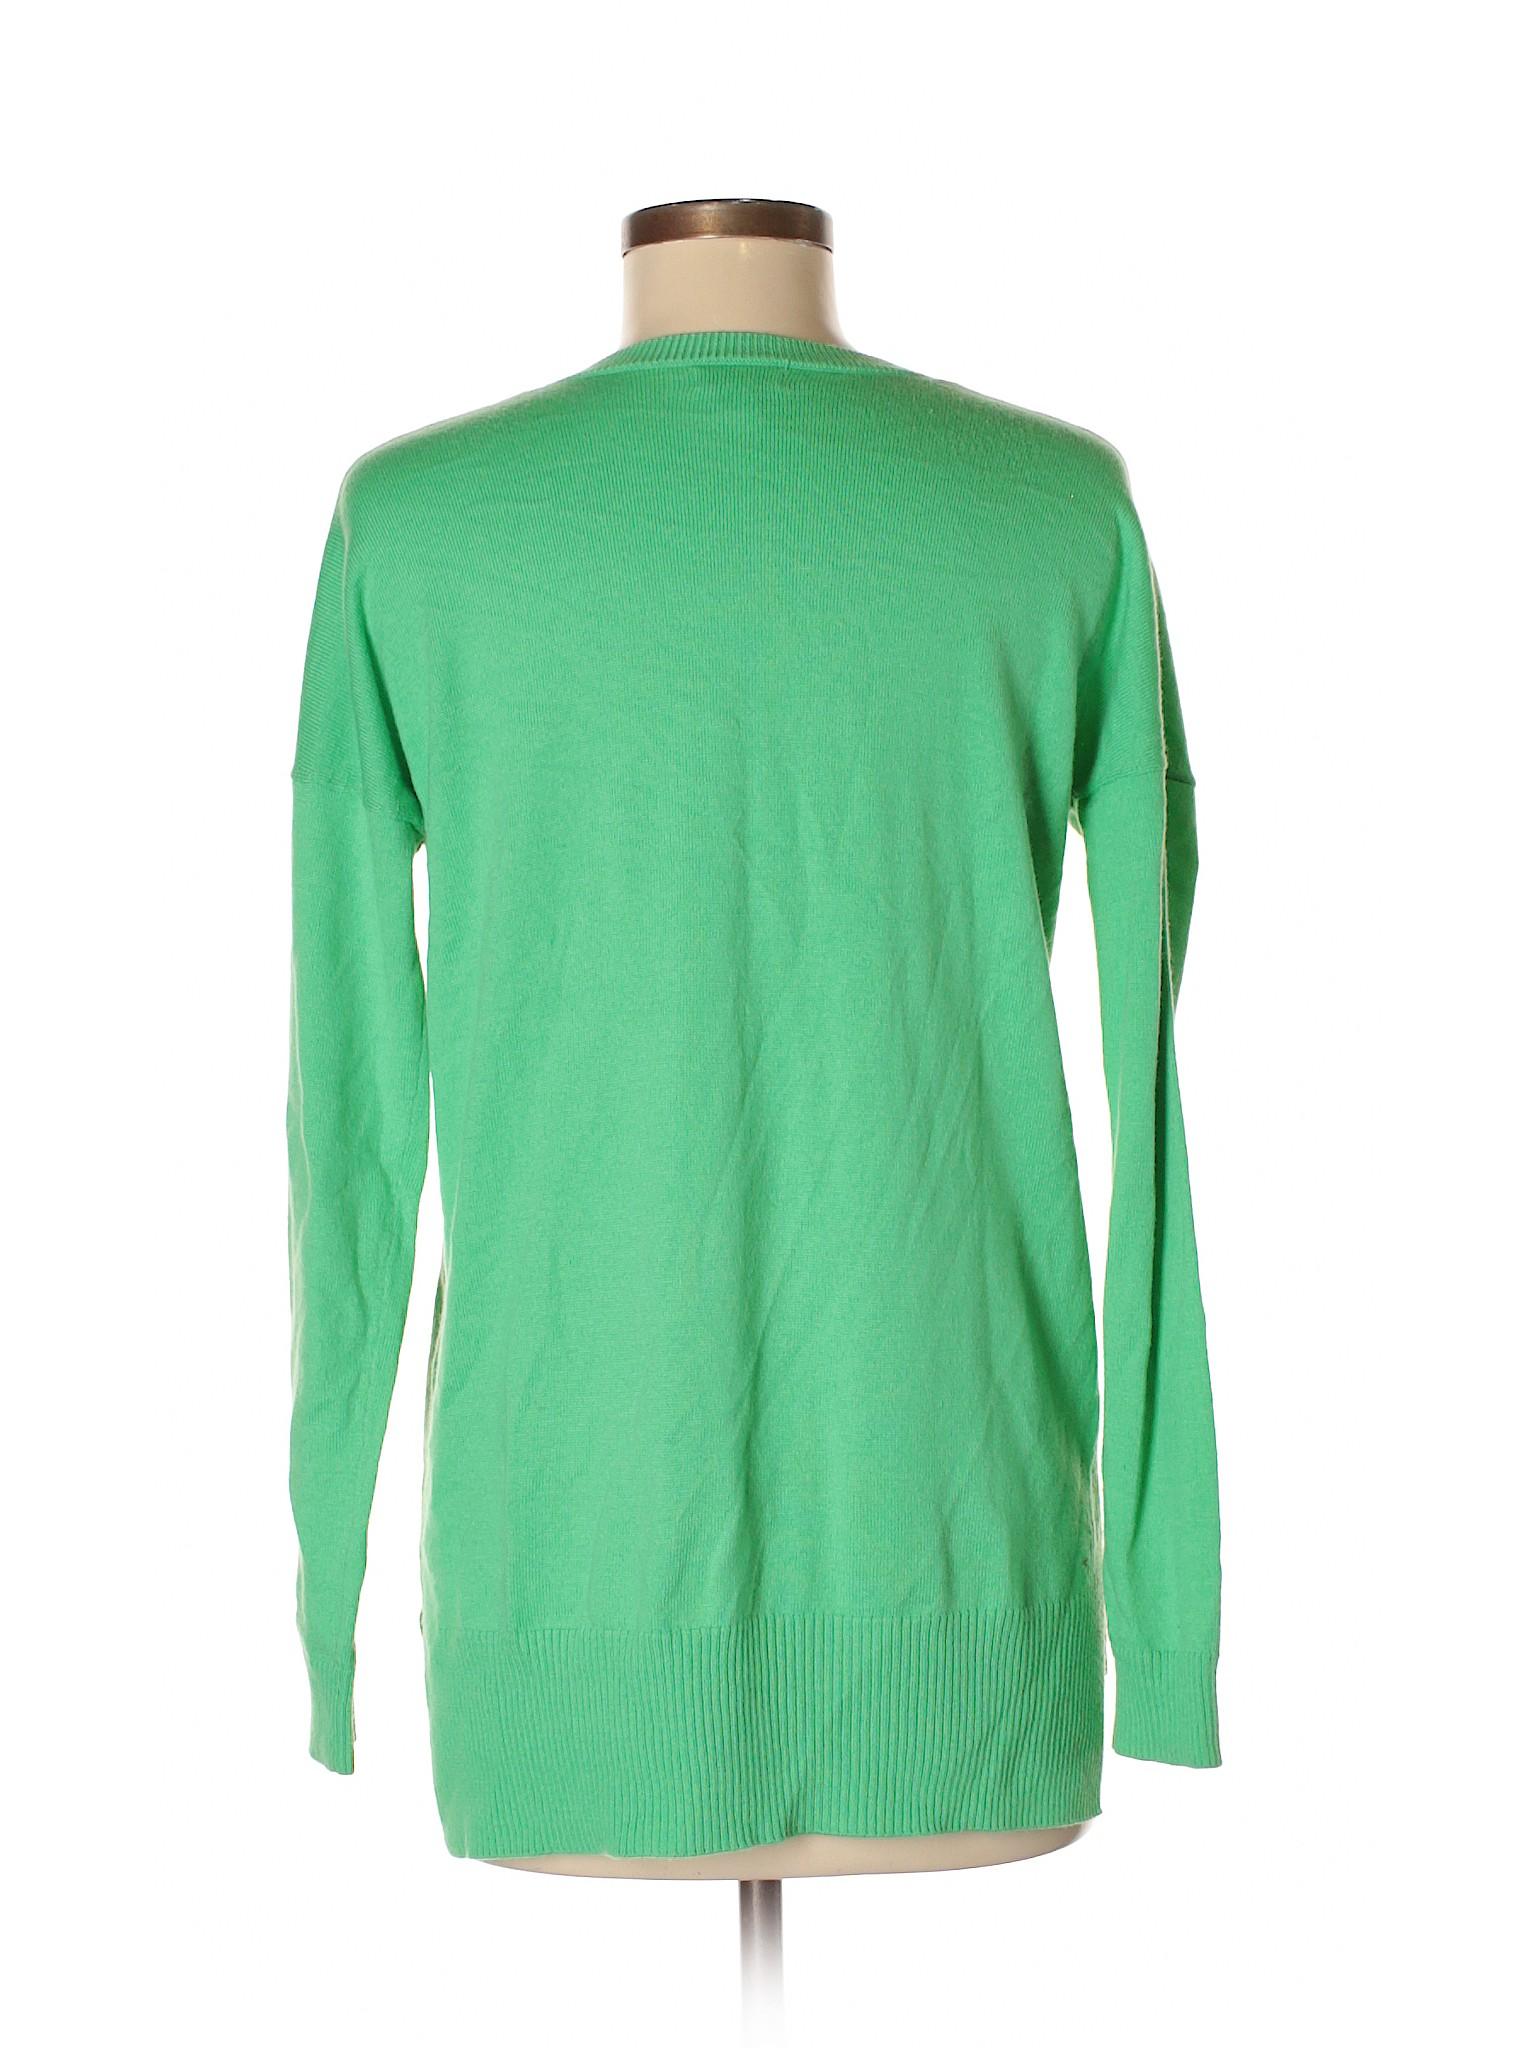 Boutique Boutique Gap Pullover Pullover Sweater Sweater Gap B6Ptx8qn